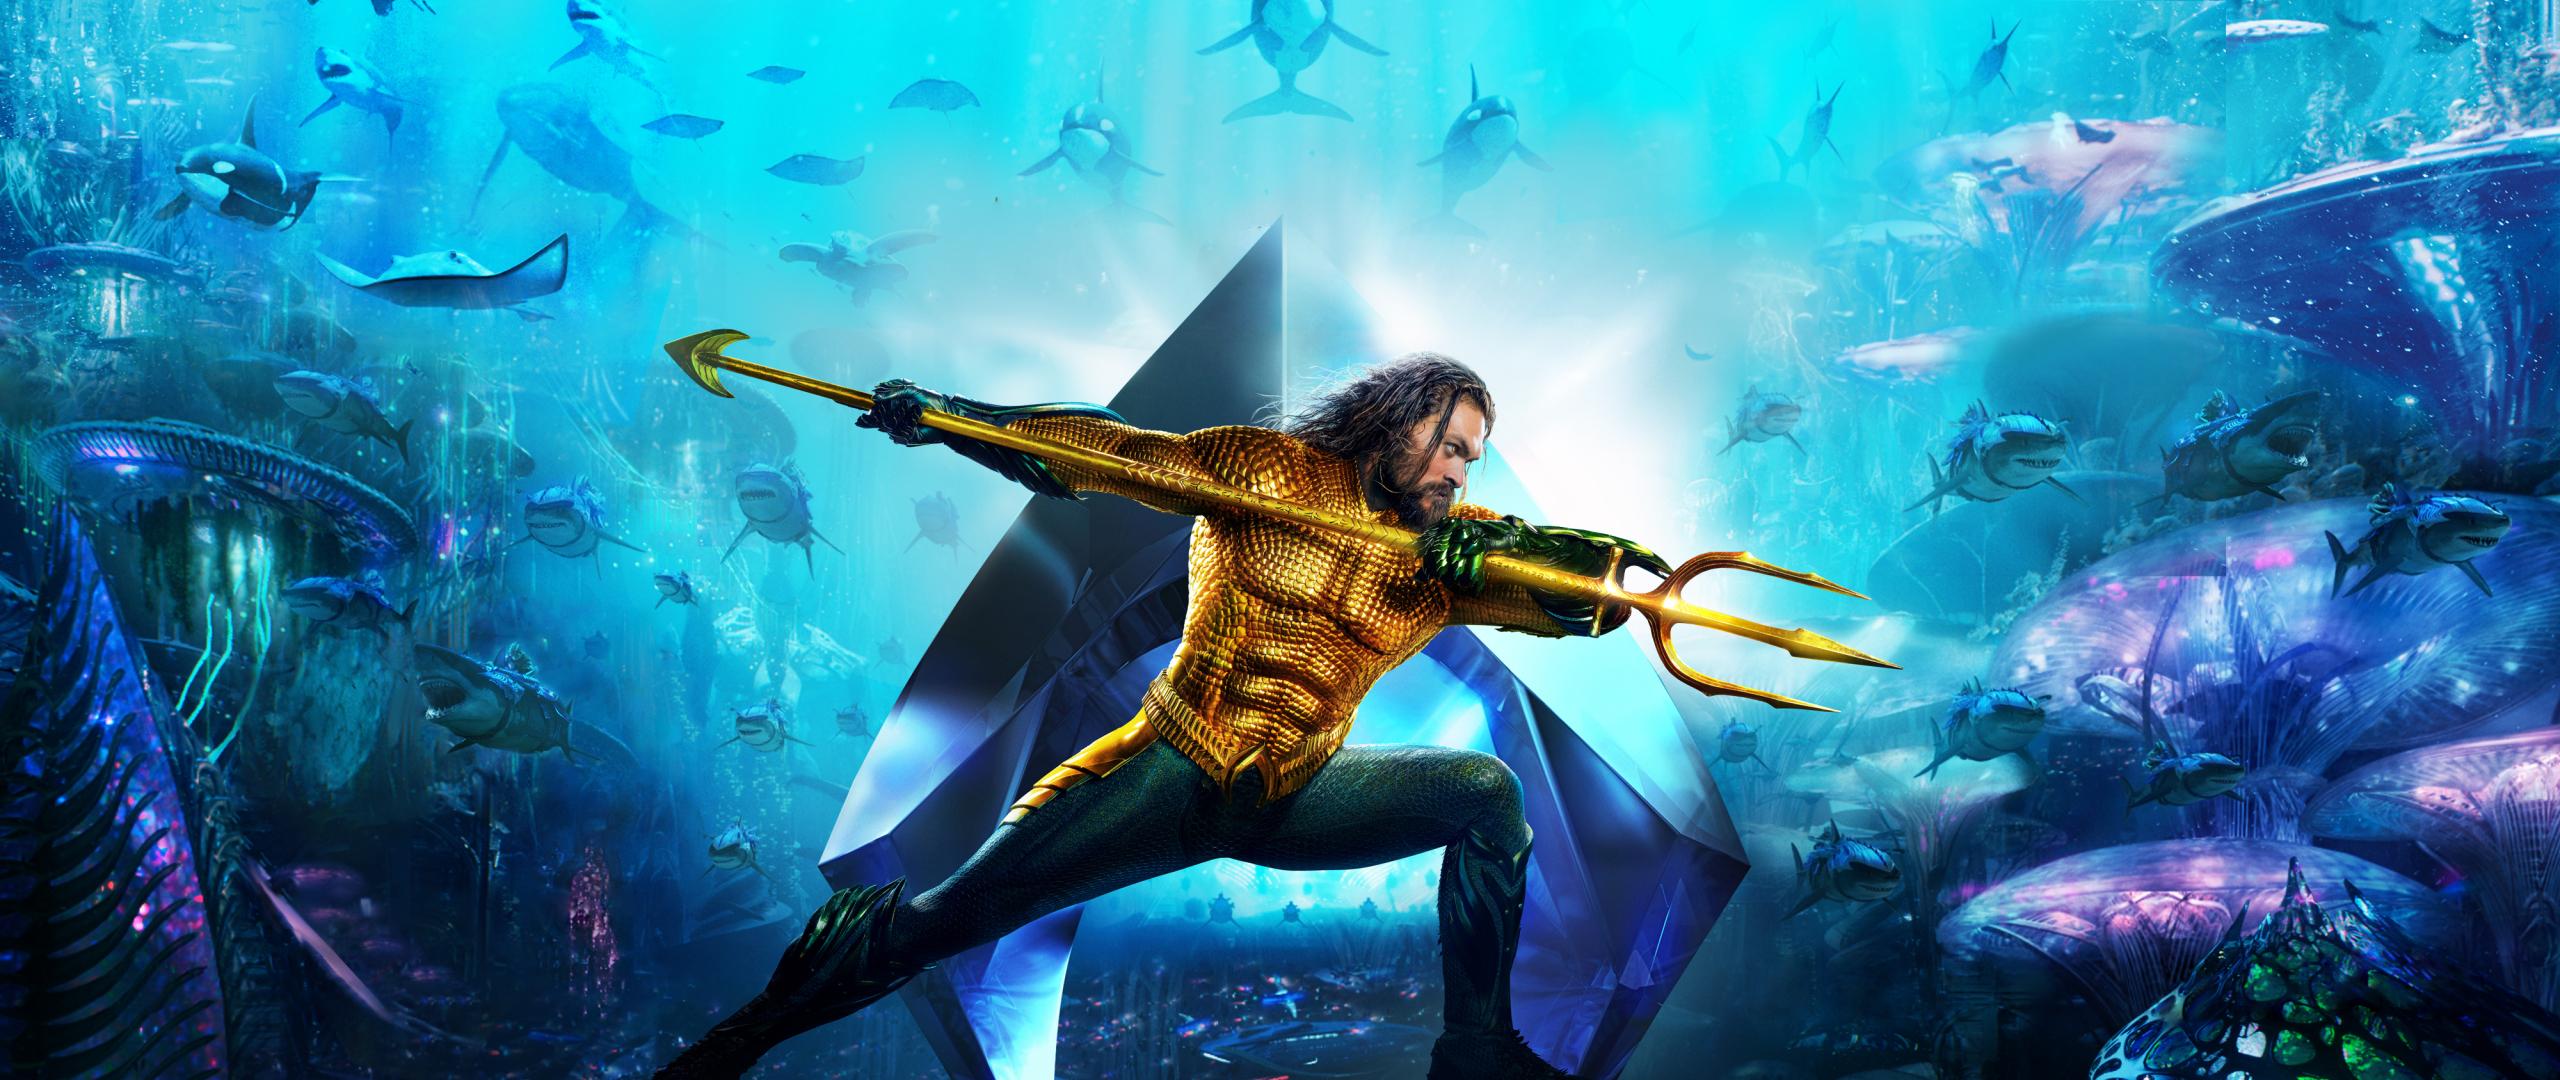 Aquaman 2018 Movie 4k Wallpapers: Download Aquaman 2018 Movie Banner Textless 480x800